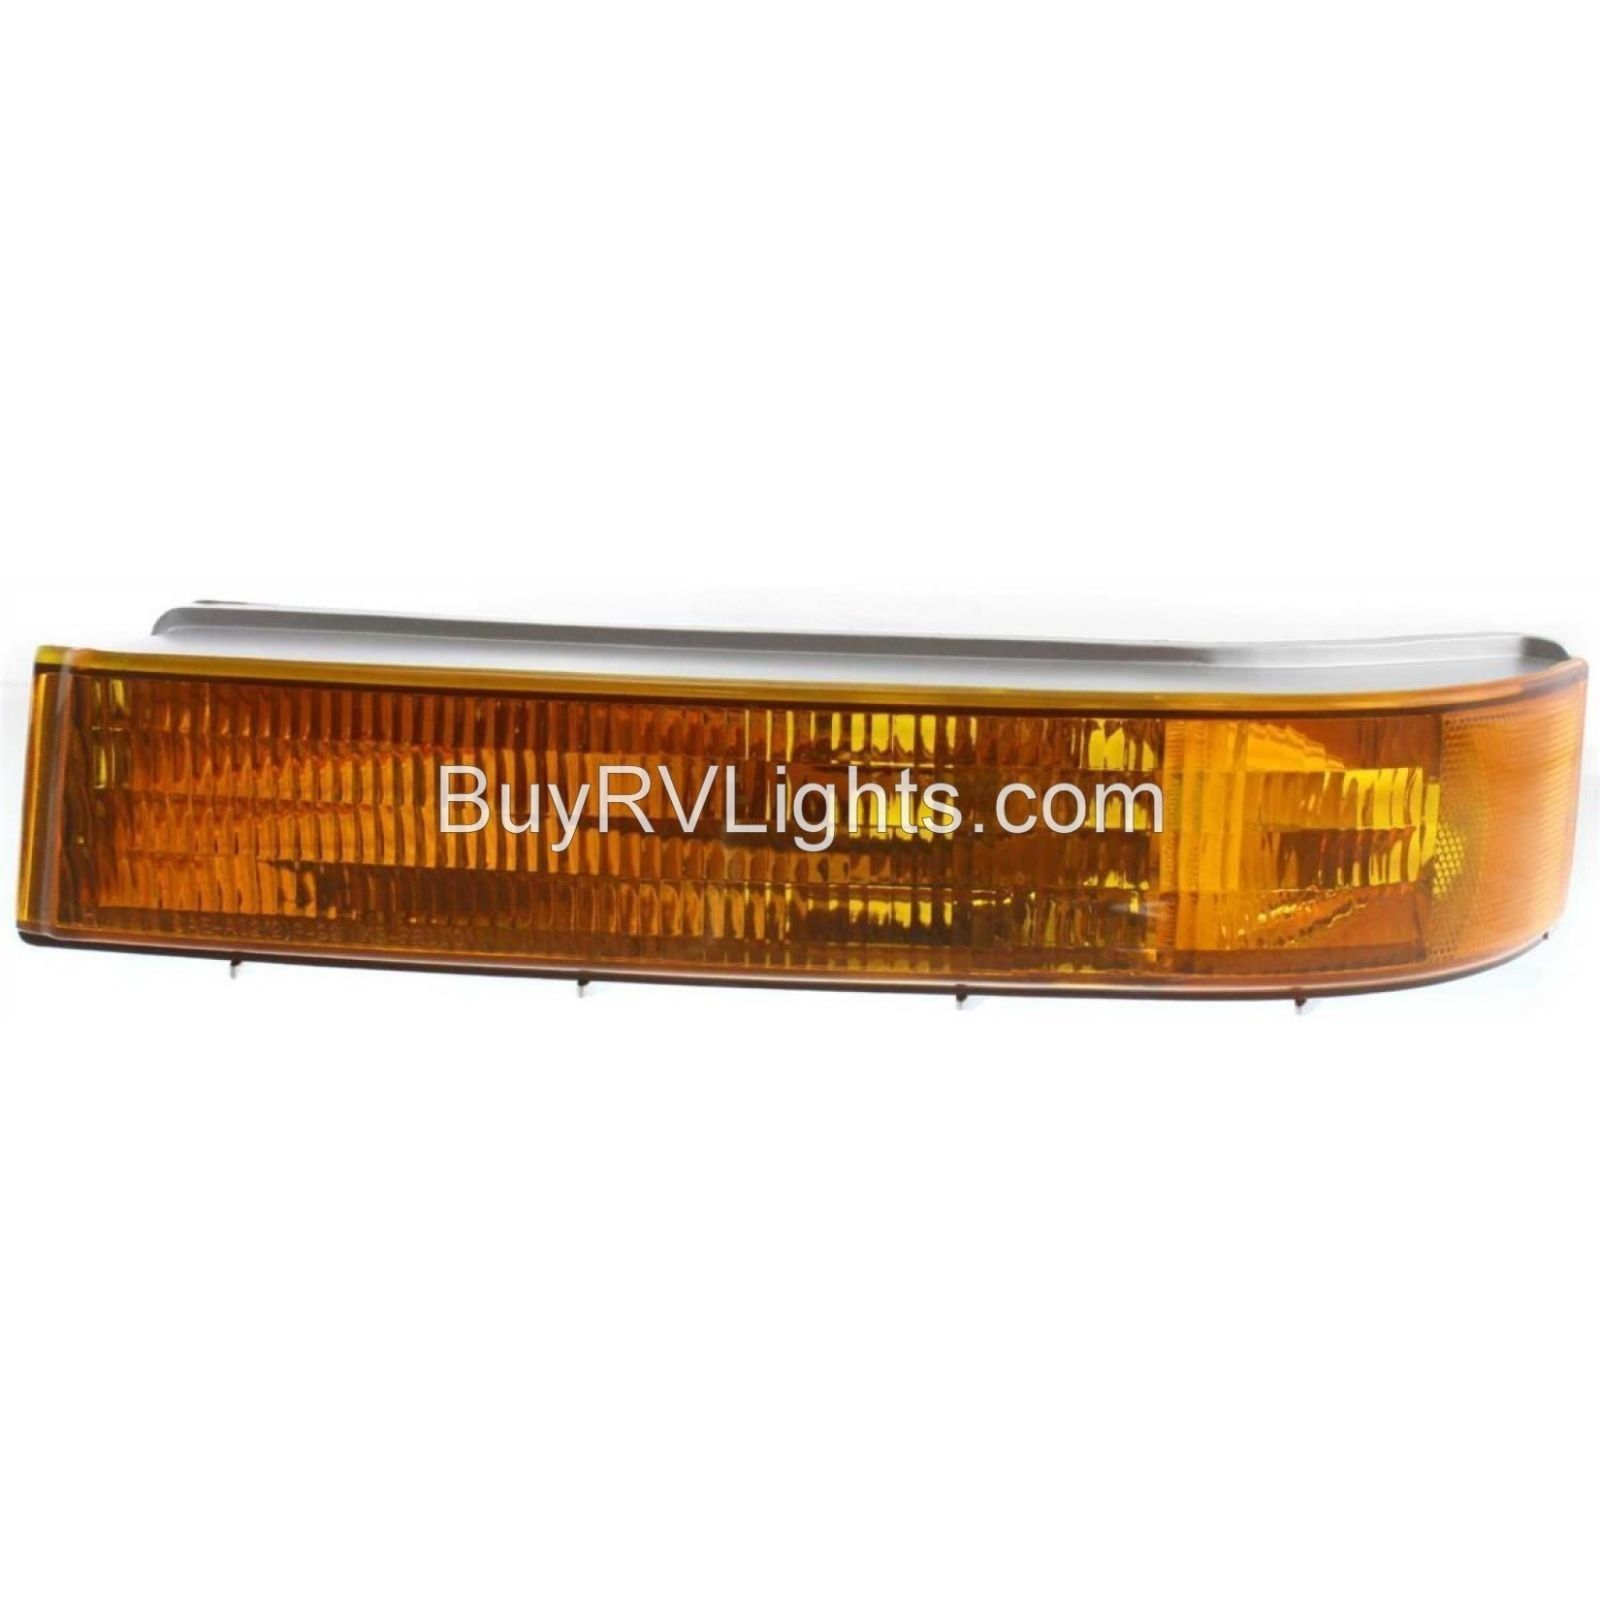 FLEETWOOD PACE ARROW VISION 1998 1999 LEFT DRIVER TURN SIGNAL LIGHT LAMP RV